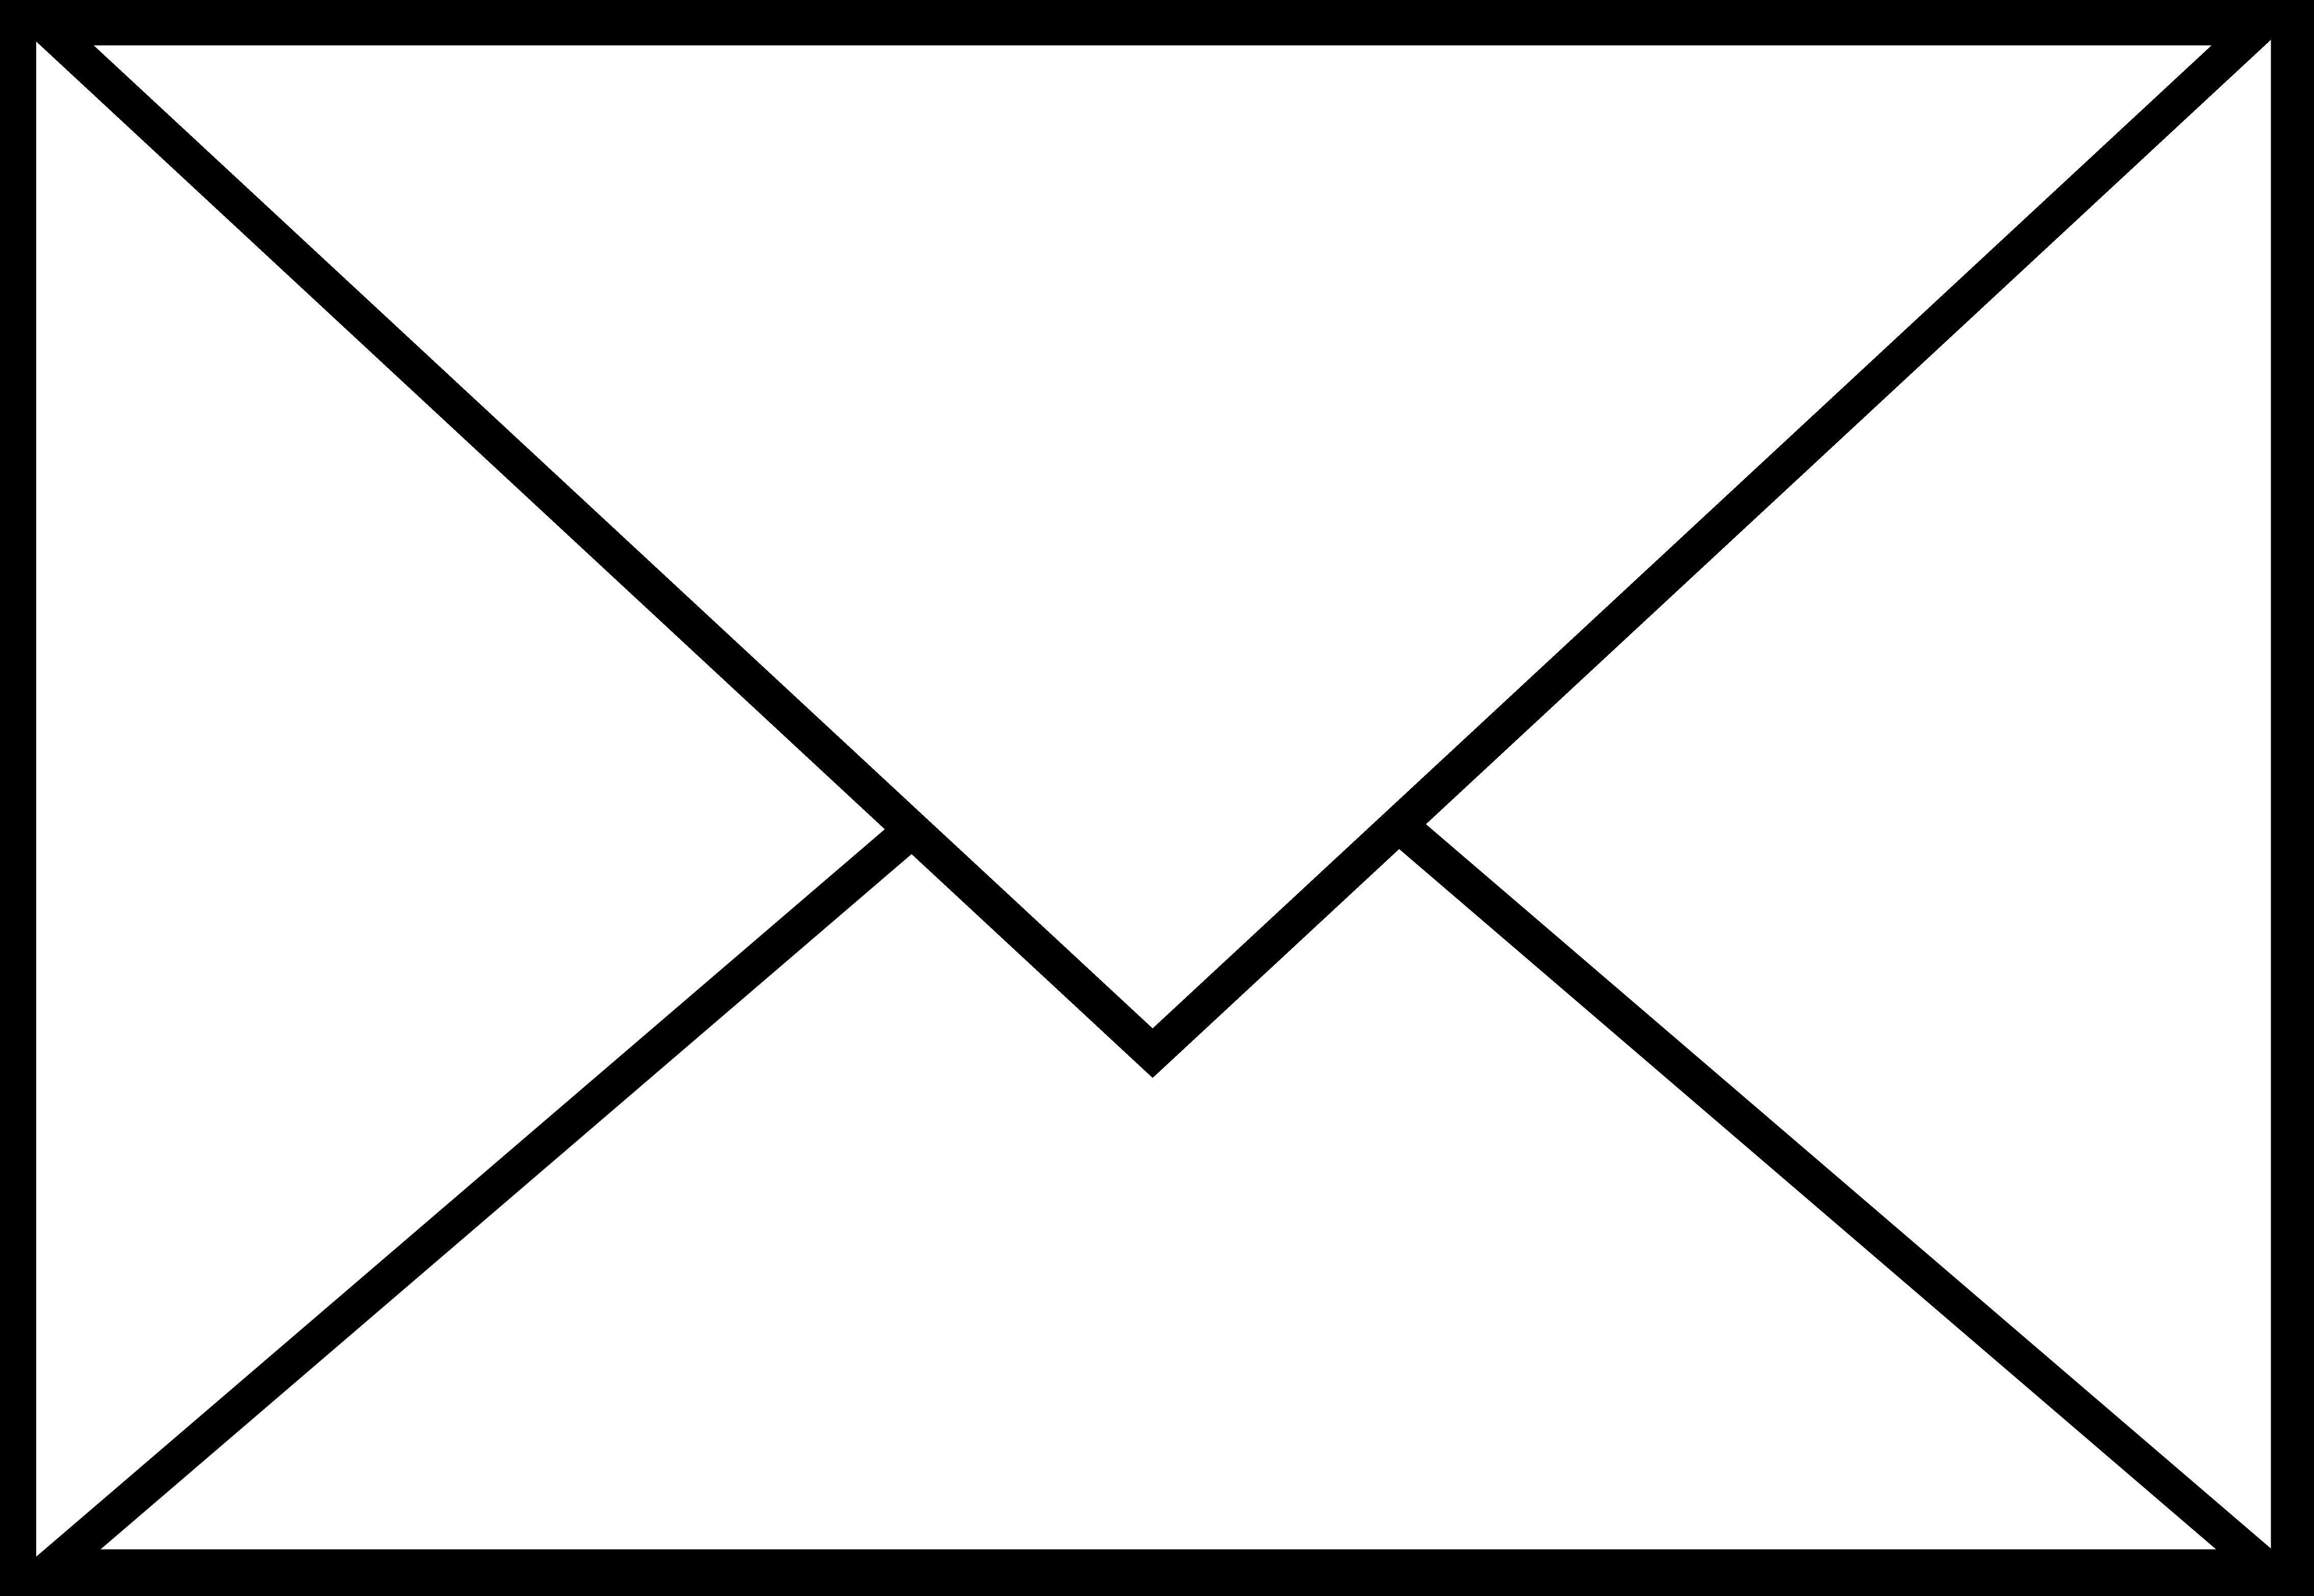 envelope clipart black and white clipart panda free clipart images rh clipartpanda com Postal Mailbox Clip Art Postal Mailbox Clip Art